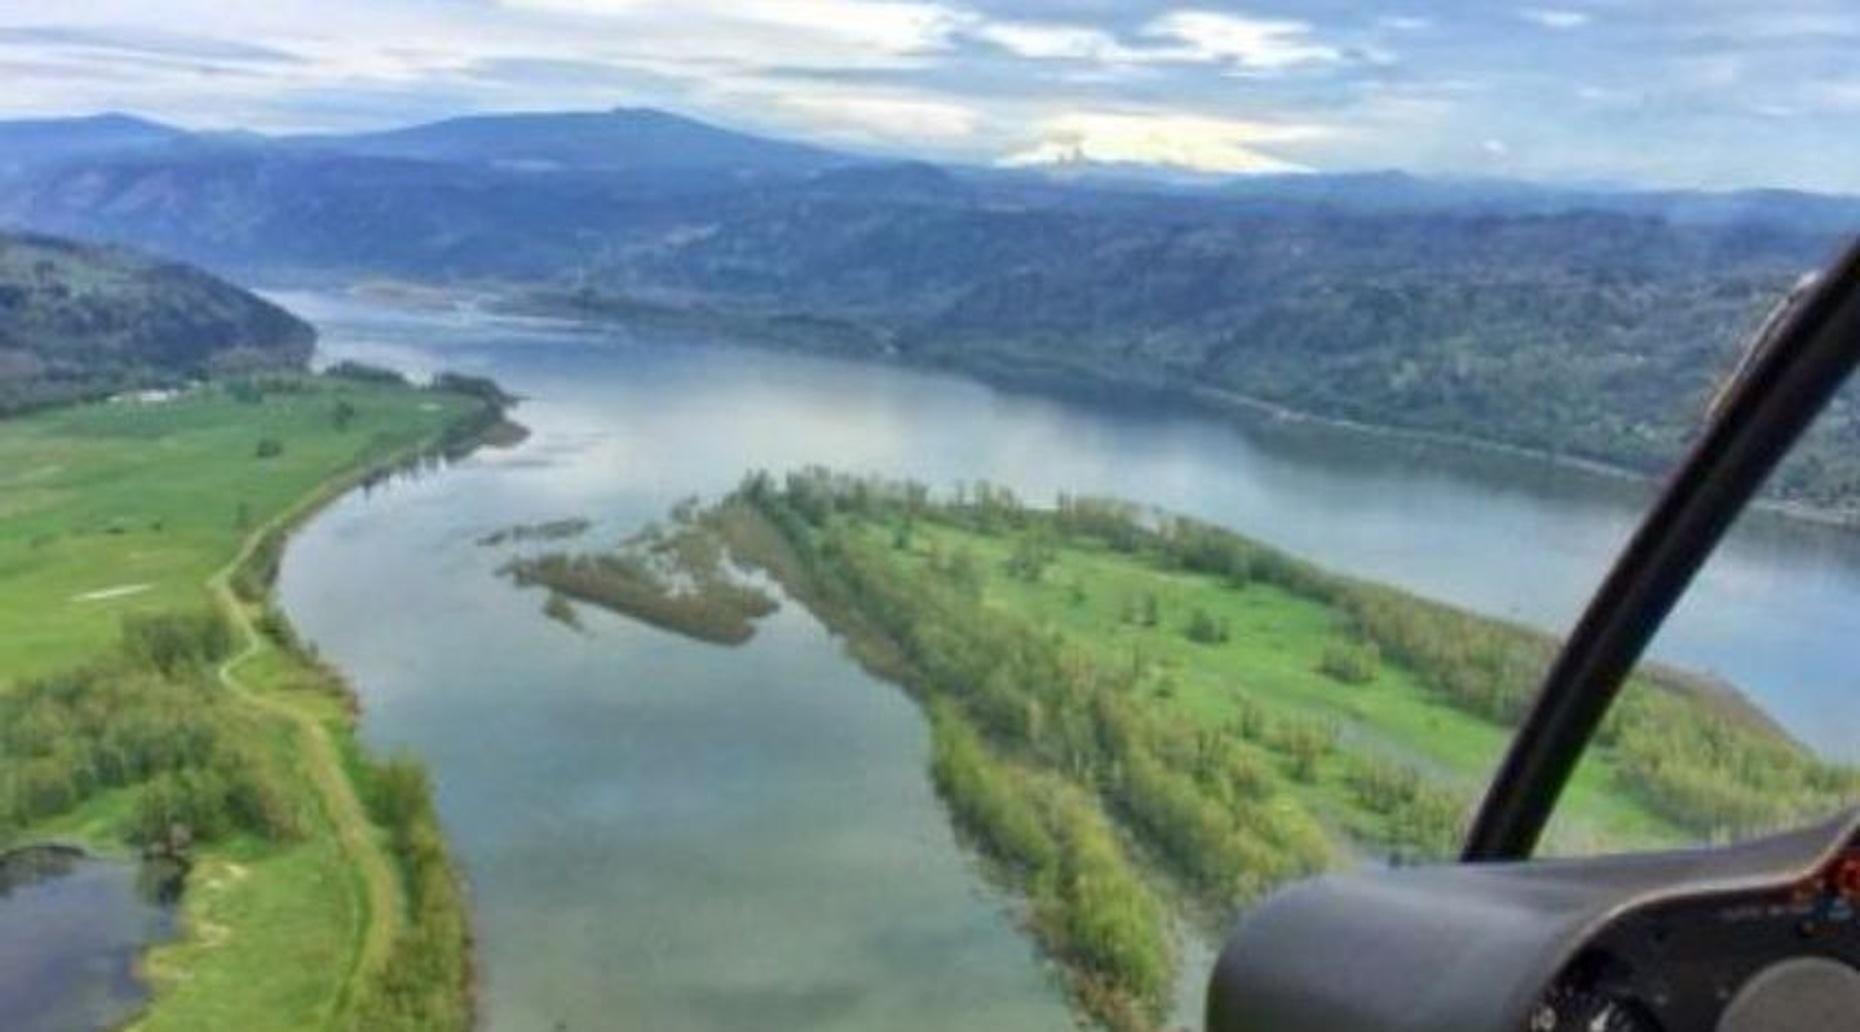 Multnomah Falls & Columbia River Gorge Tour